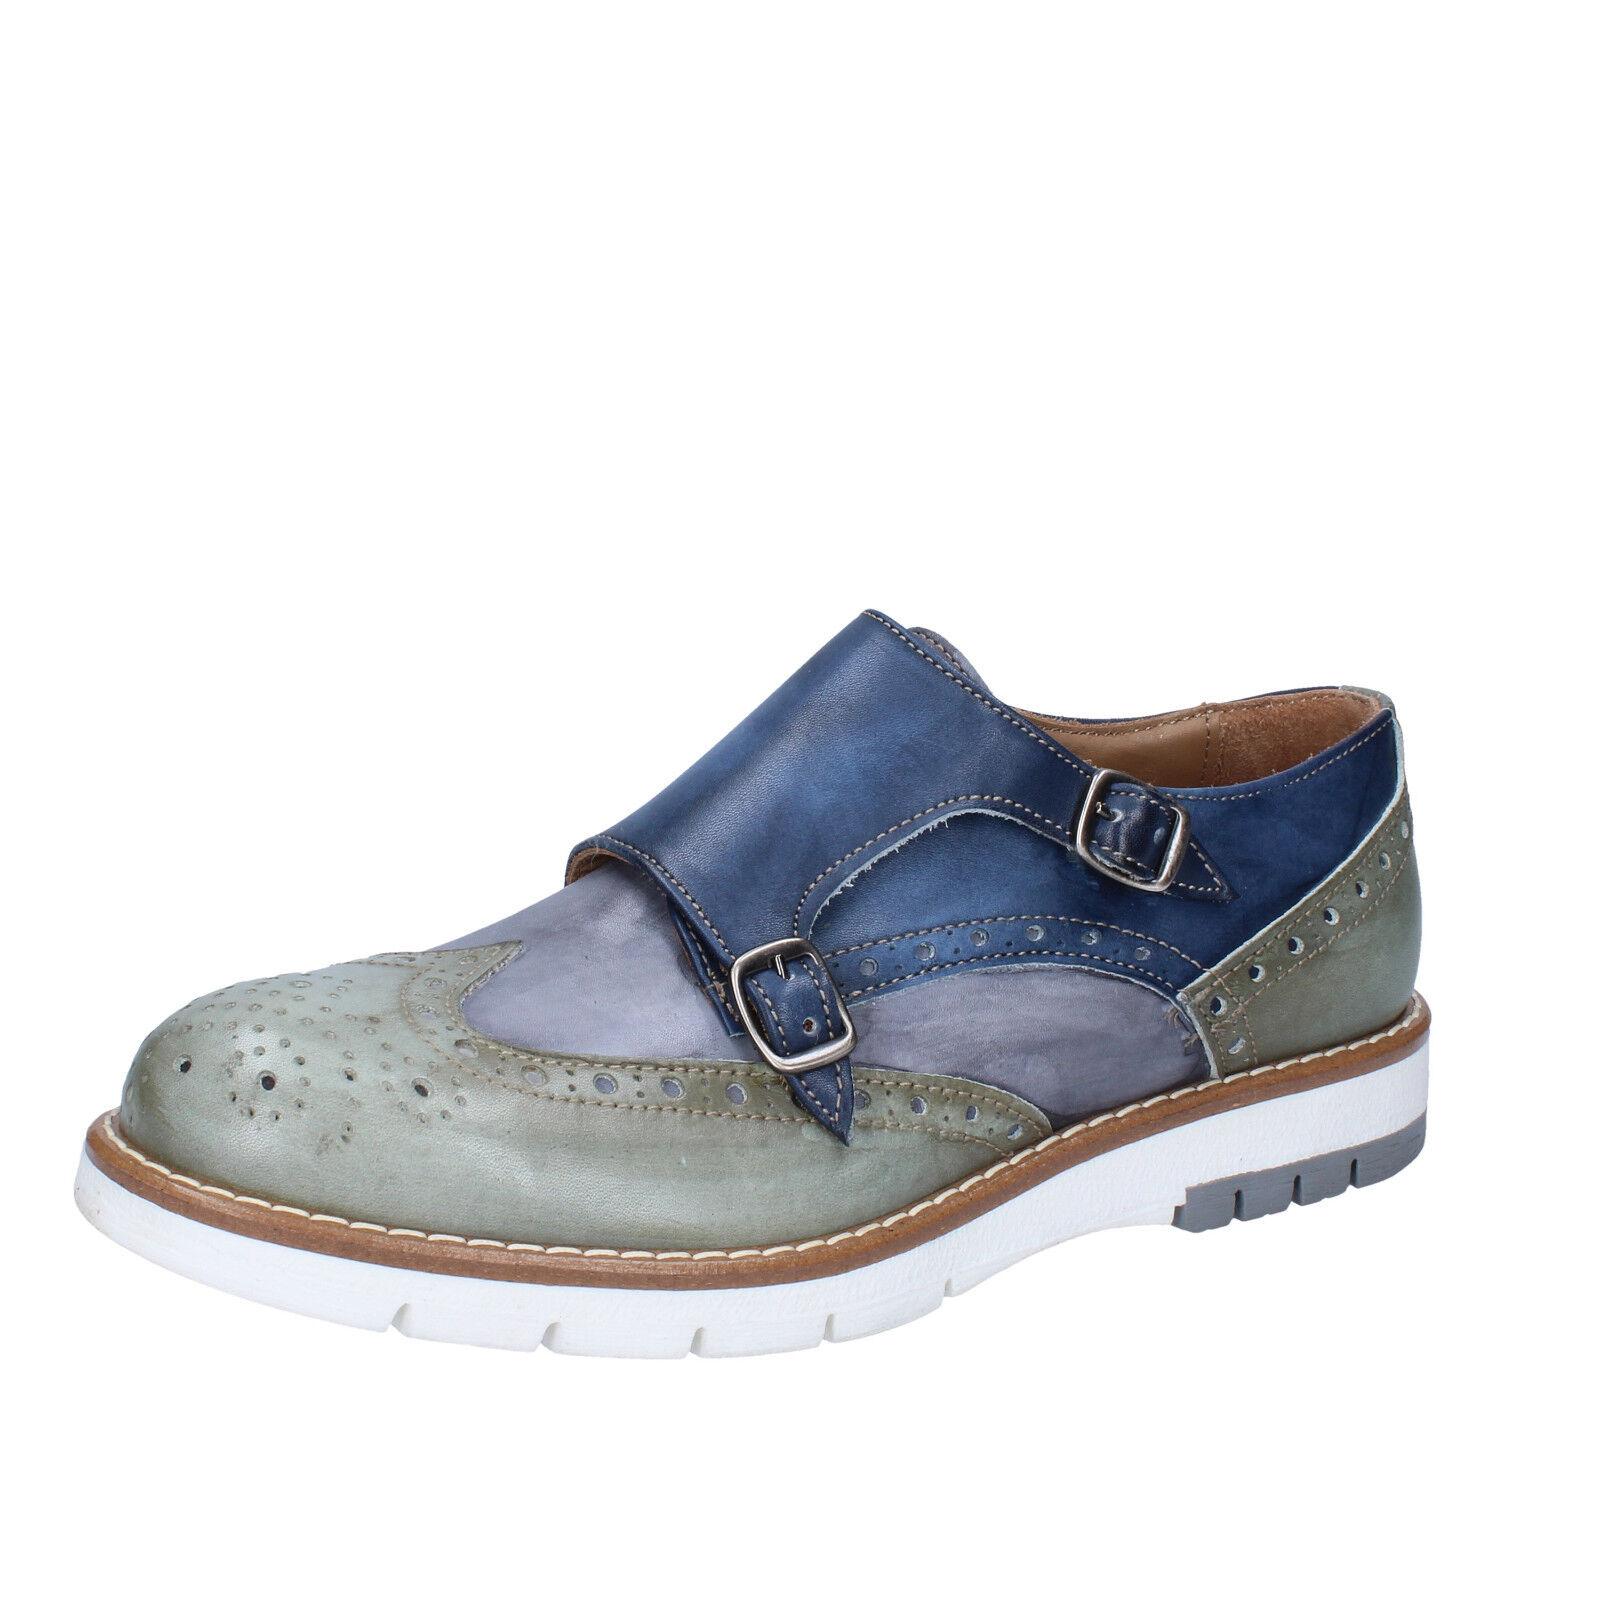 Mens shoes DI MELLA 11 (EU 45) elegant bluee green leather AB928-F